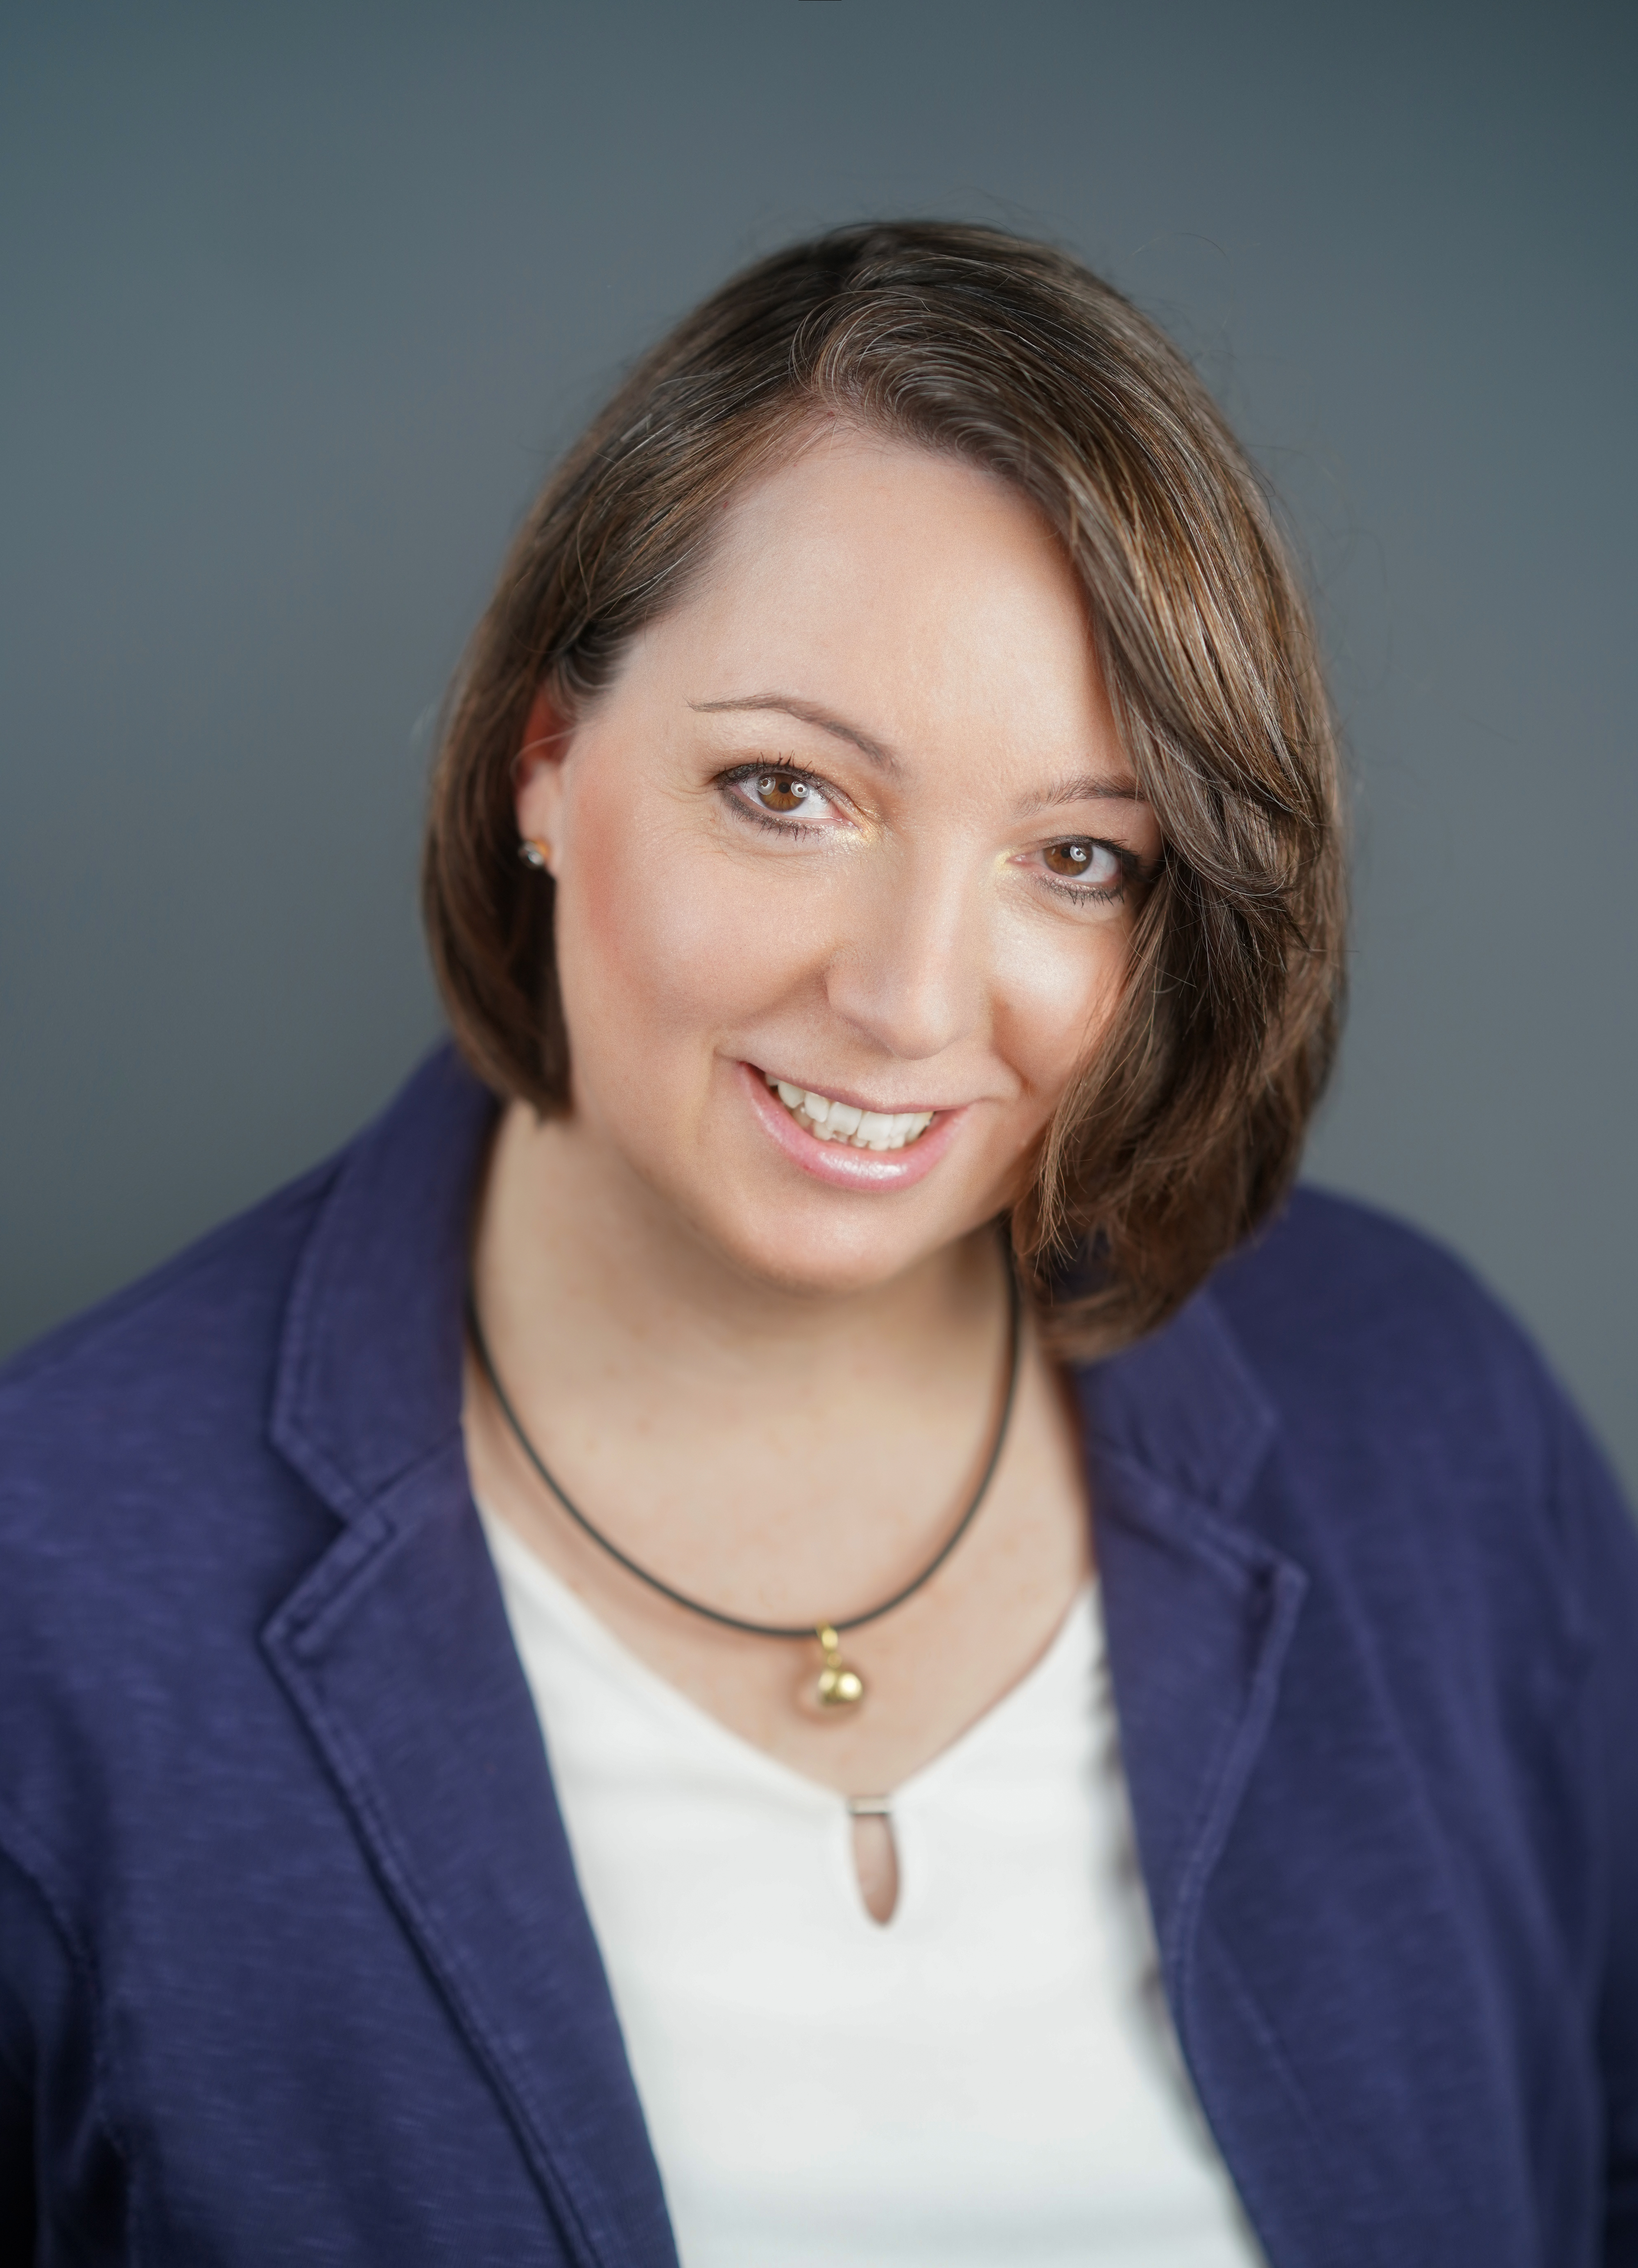 Katja Schlüpfriger, Gesundheitsadministrator